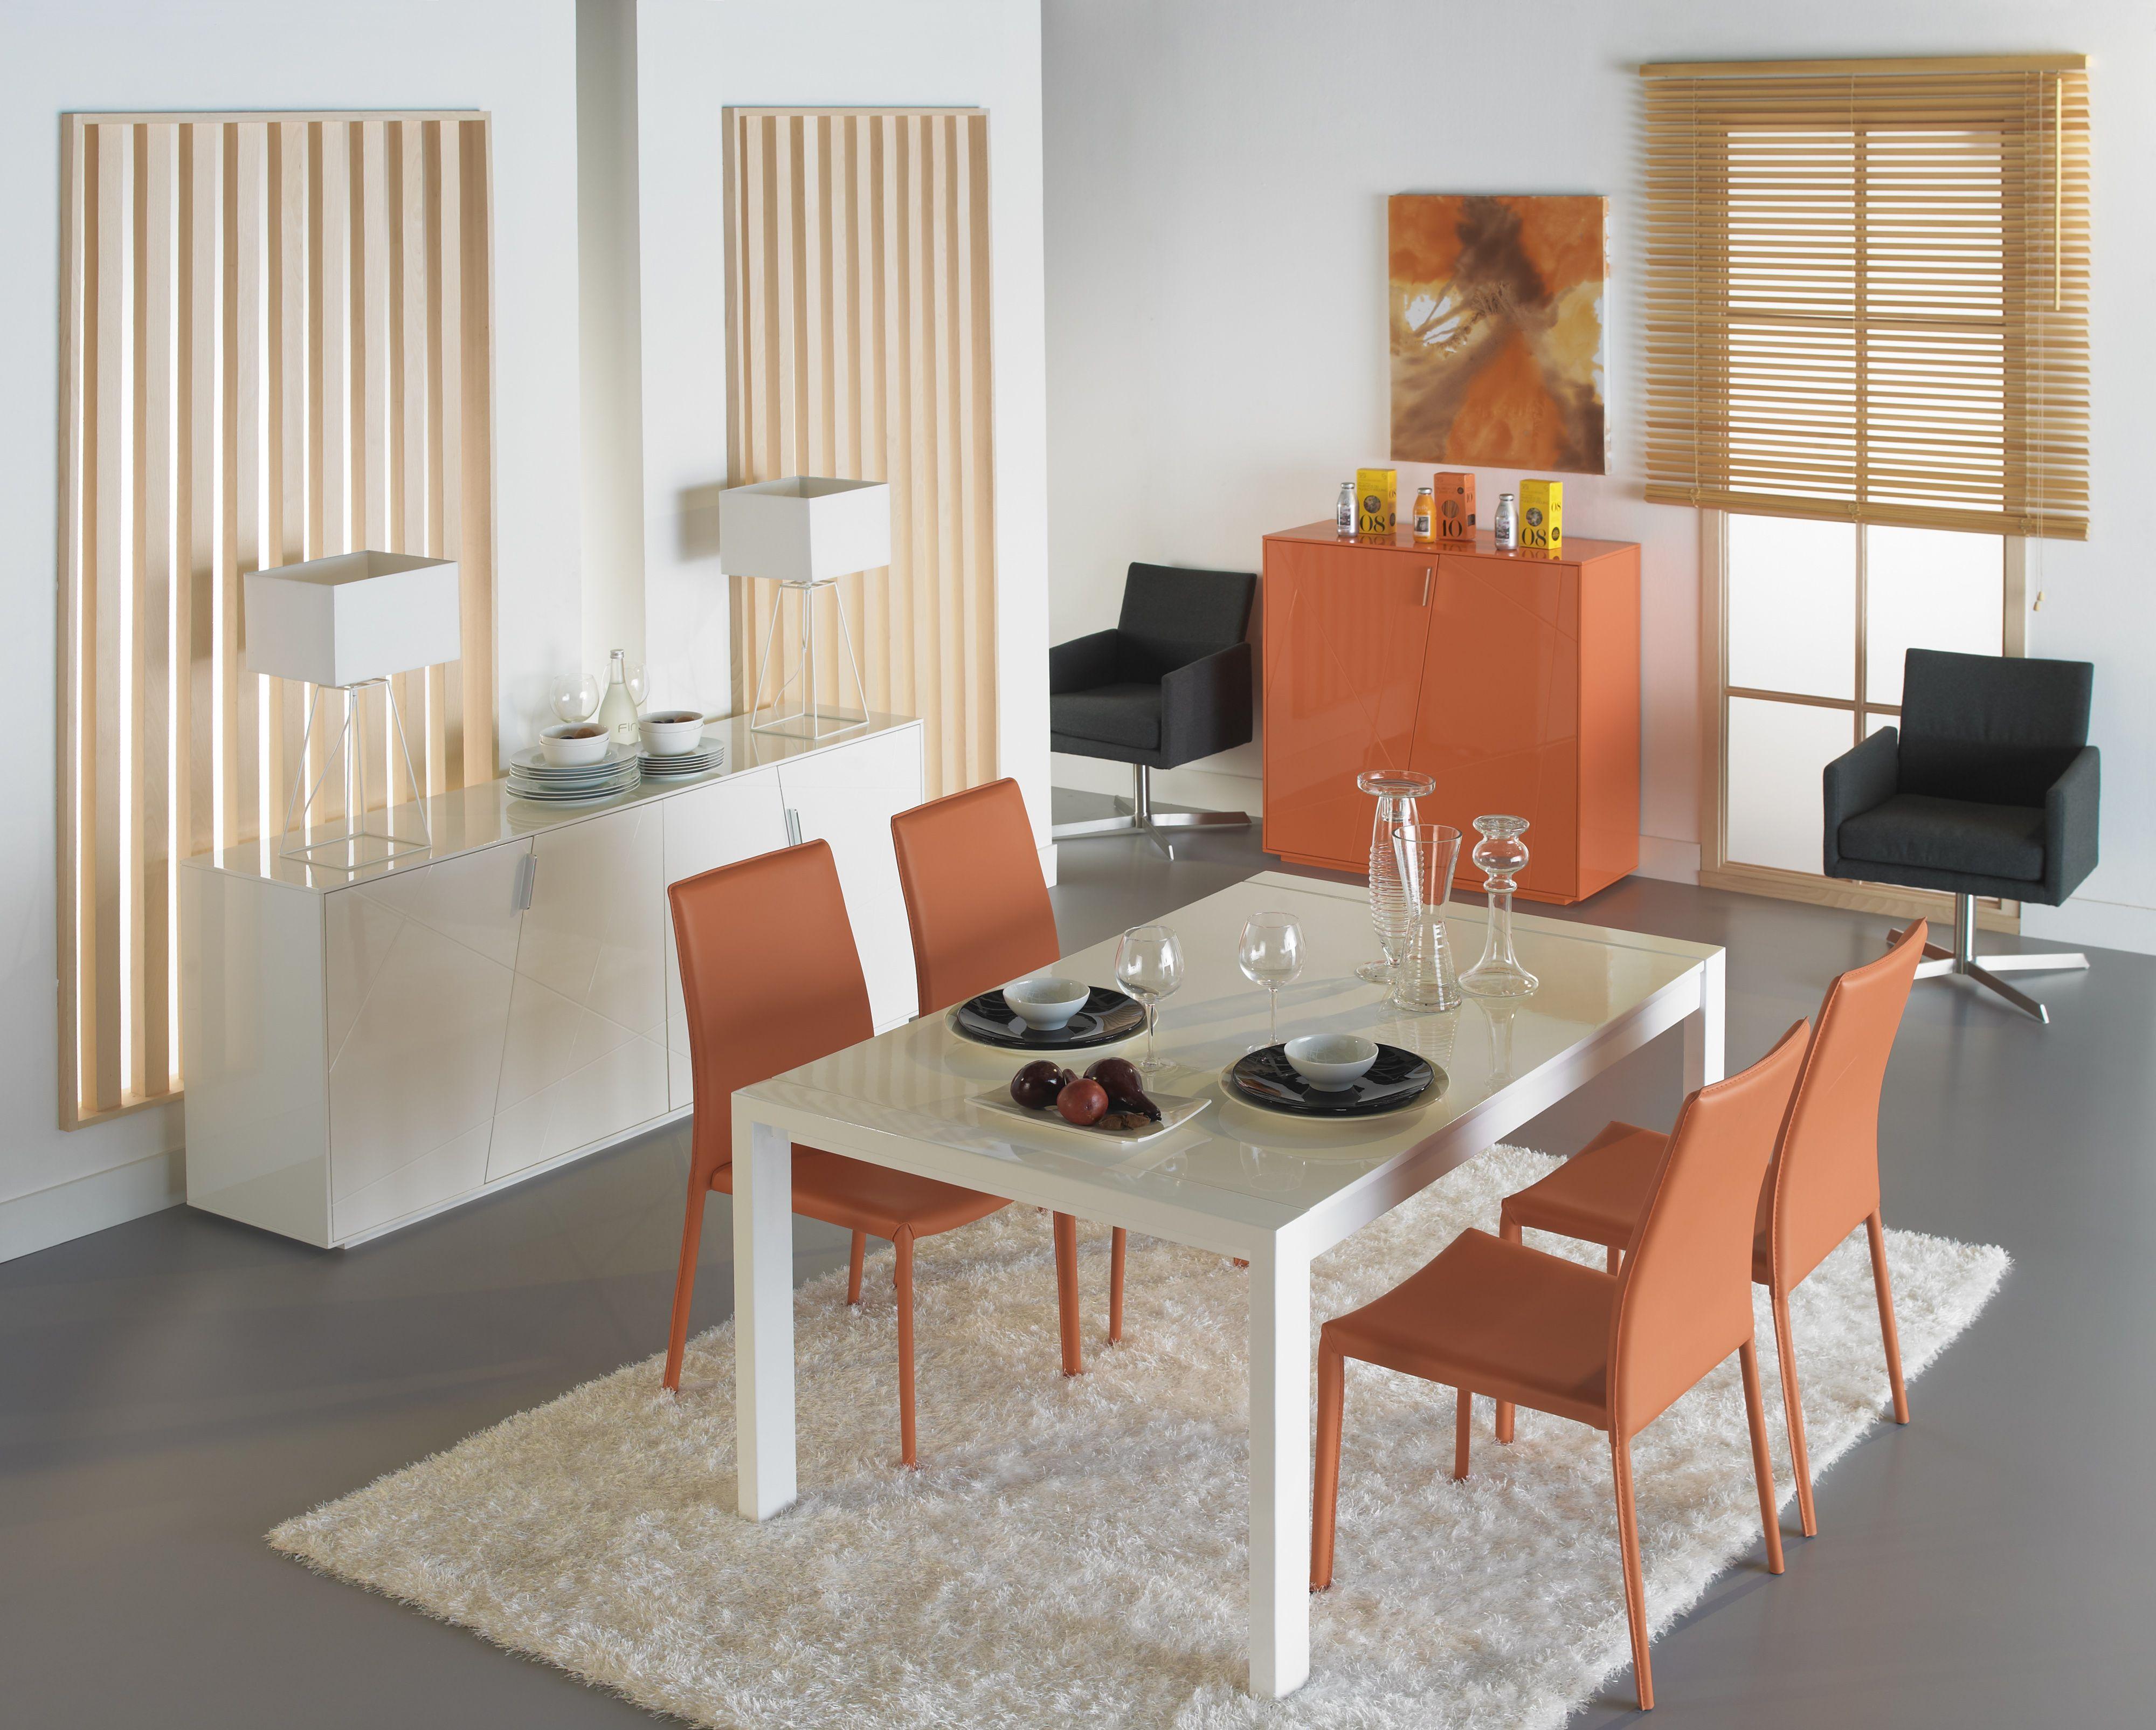 Moderna composici n en blanco y naranja muebles comedor for Outlet muebles hogar y decoracion madrid